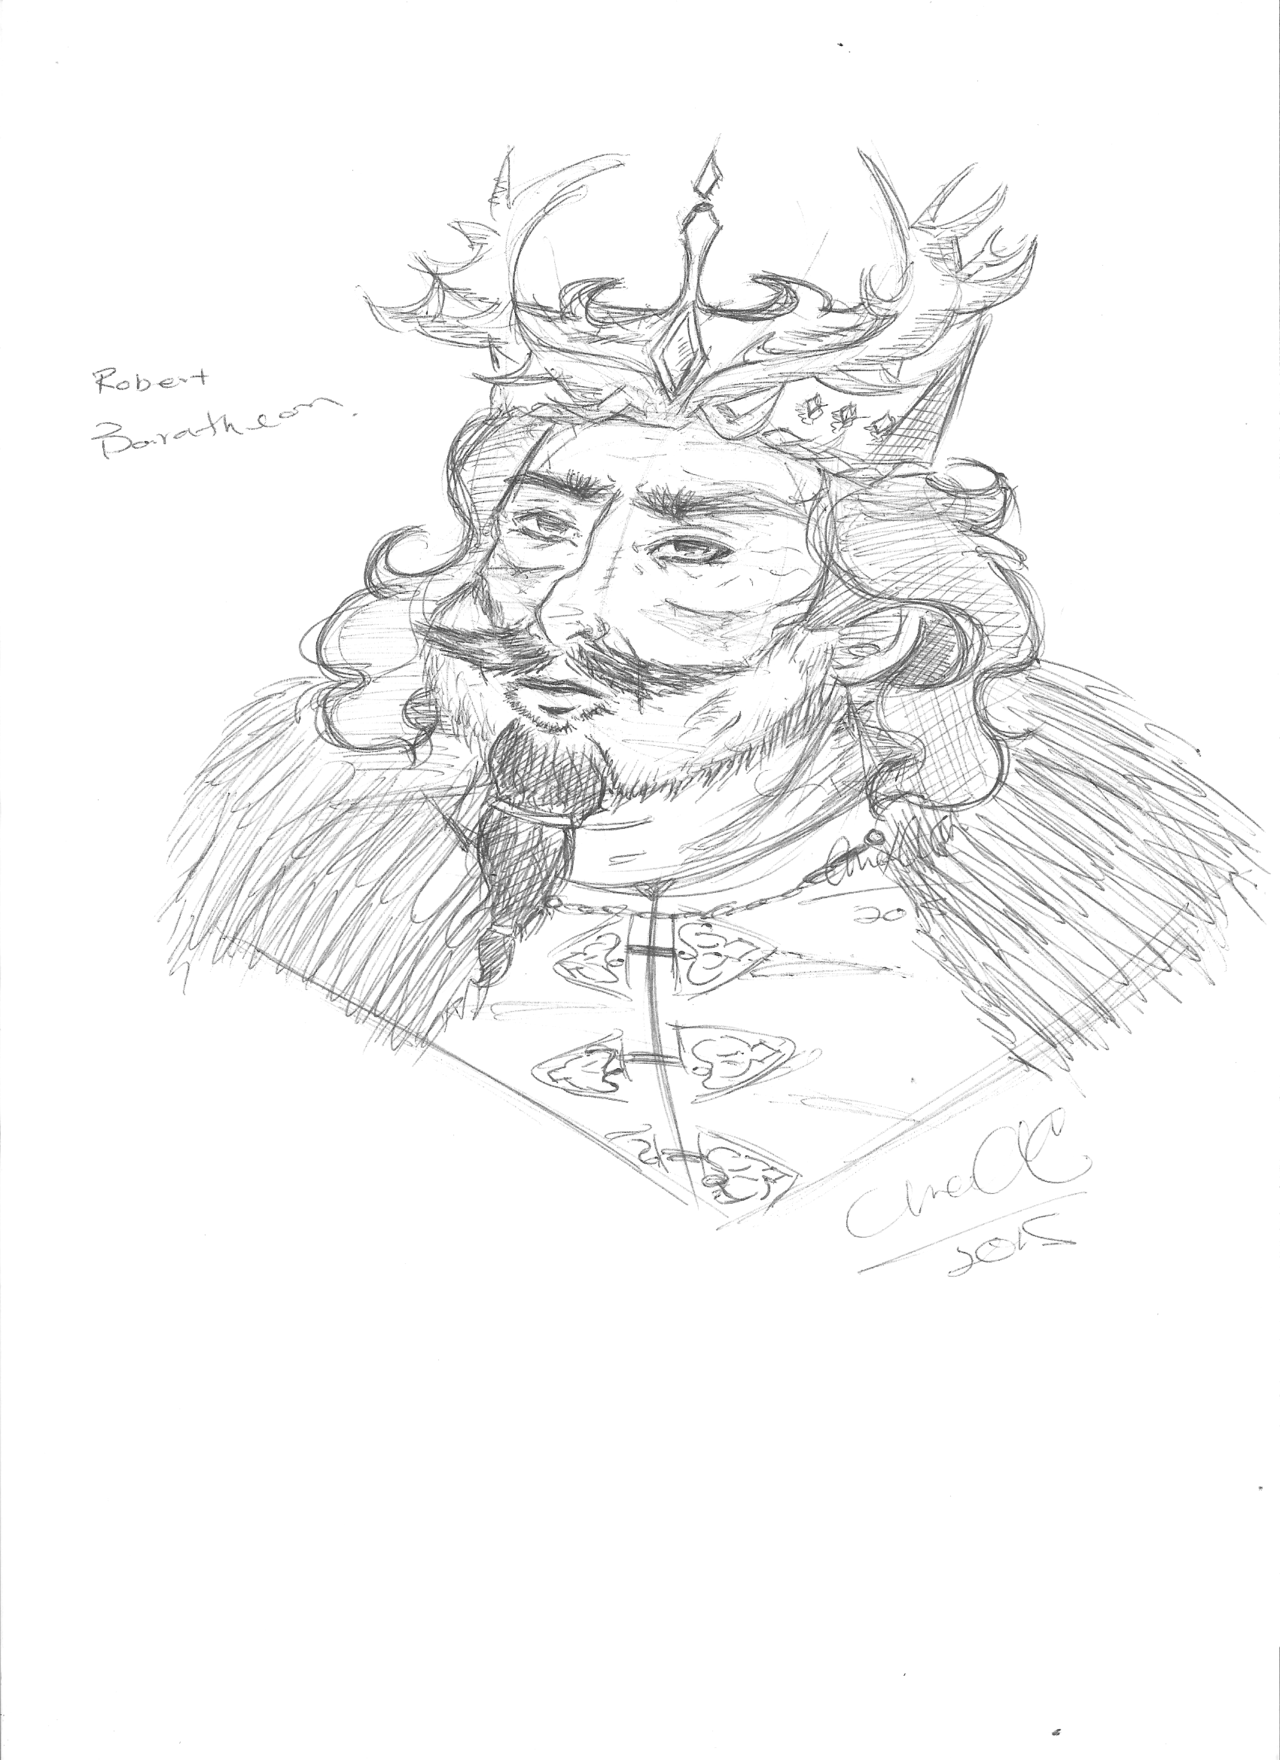 Robert Baratheon coloring #11, Download drawings